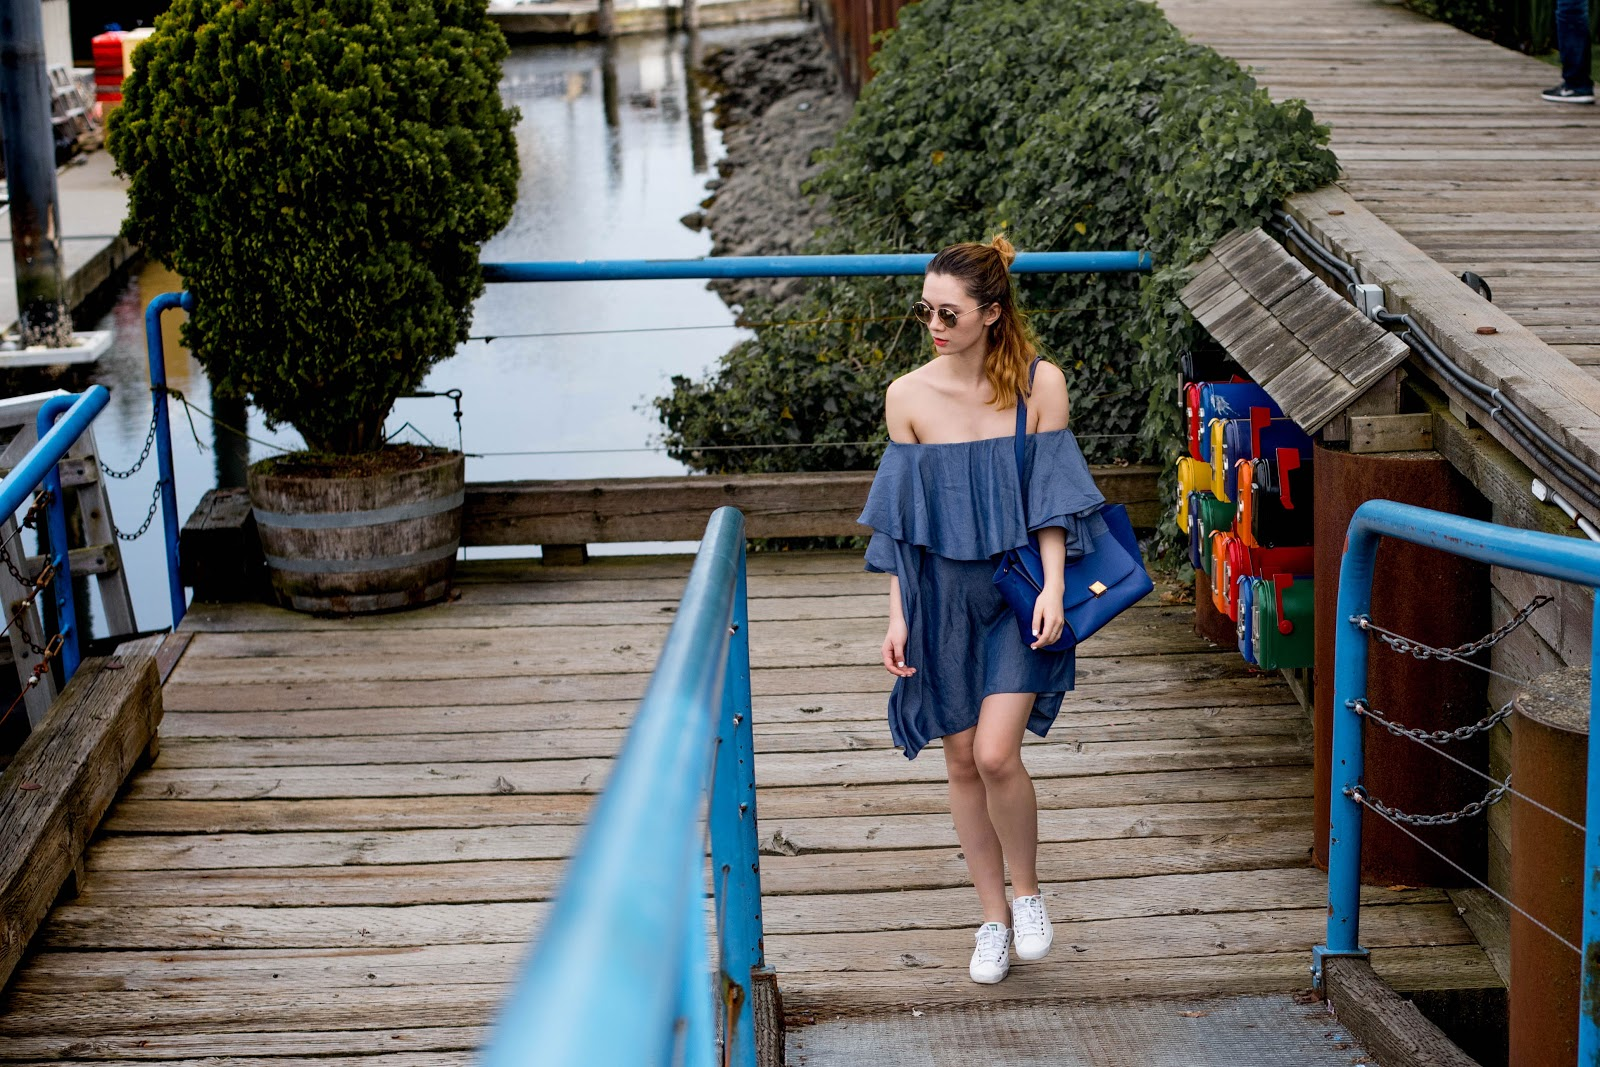 Maison Dress, MLM Label, Celine, Celine trapeze indigo, keds sneakers, granville island, vancouver fashion